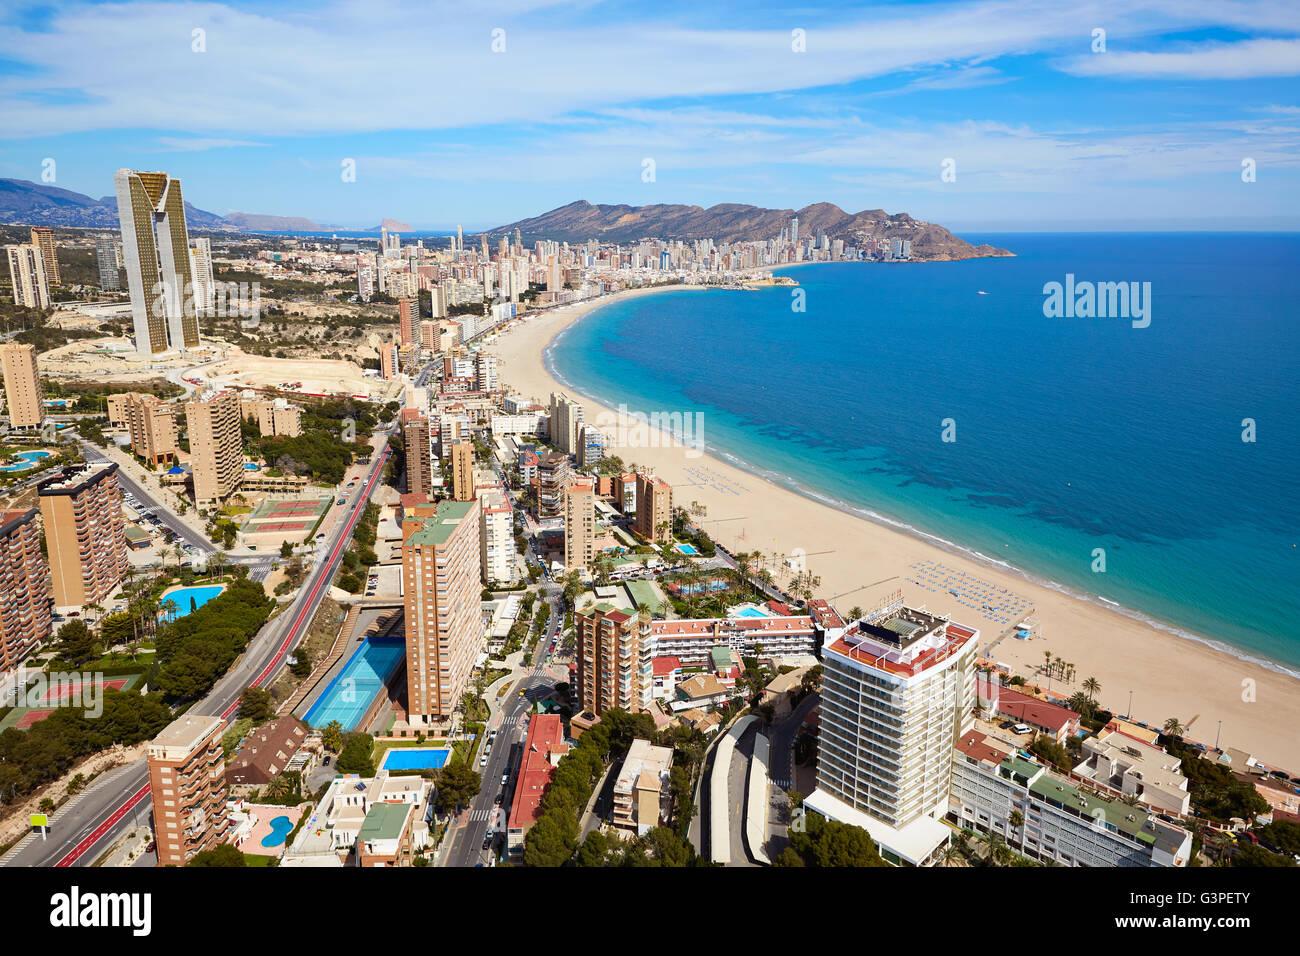 Aerial view of benidorm stock photos aerial view of - Stock uno alicante ...